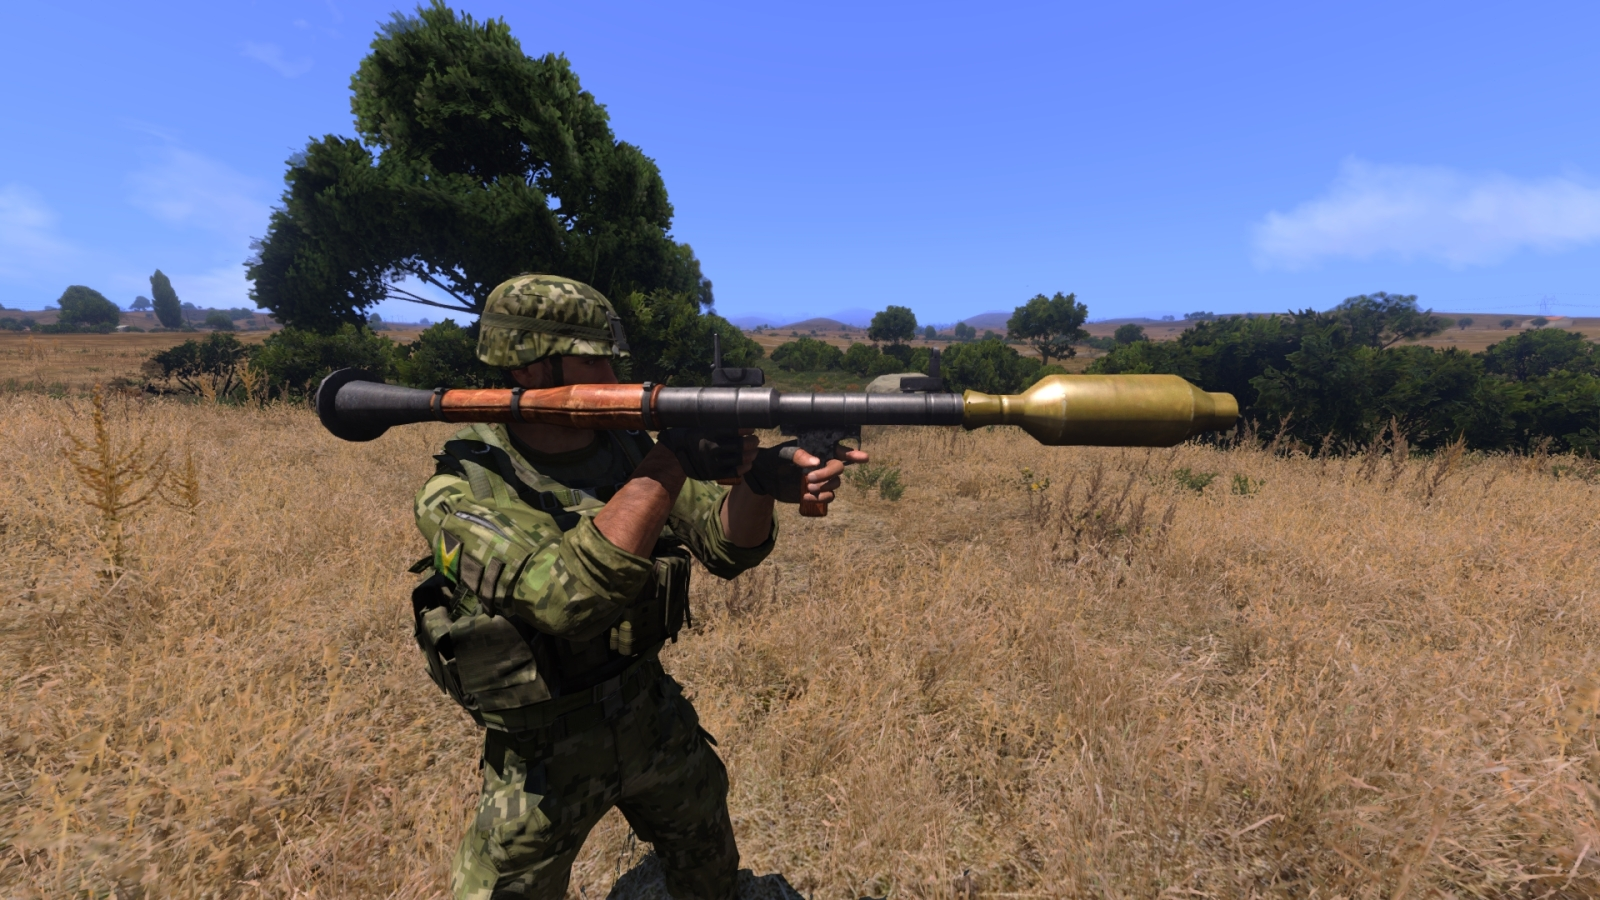 arma 2 rpg 7 rockets